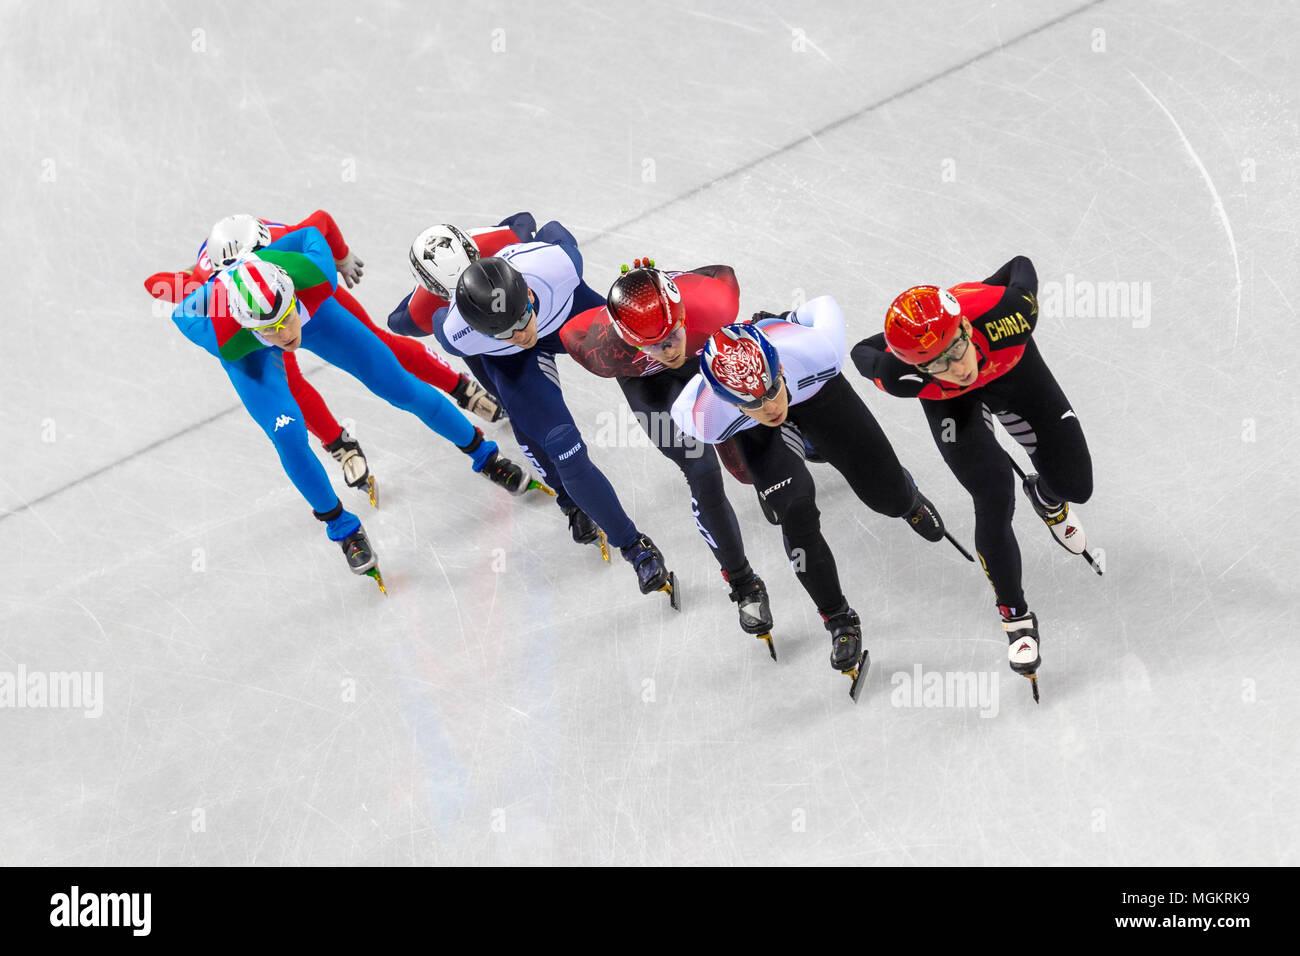 Itzhak De Laat (NED),Tommaso Dotti (ITA), Daeheon Hwang (KOR), Vladislav Bykanov (ISR), Pascal Dion (CAN), chanson de l'ONU Choe (PKR) et Wu Dajing (CHN) com Photo Stock